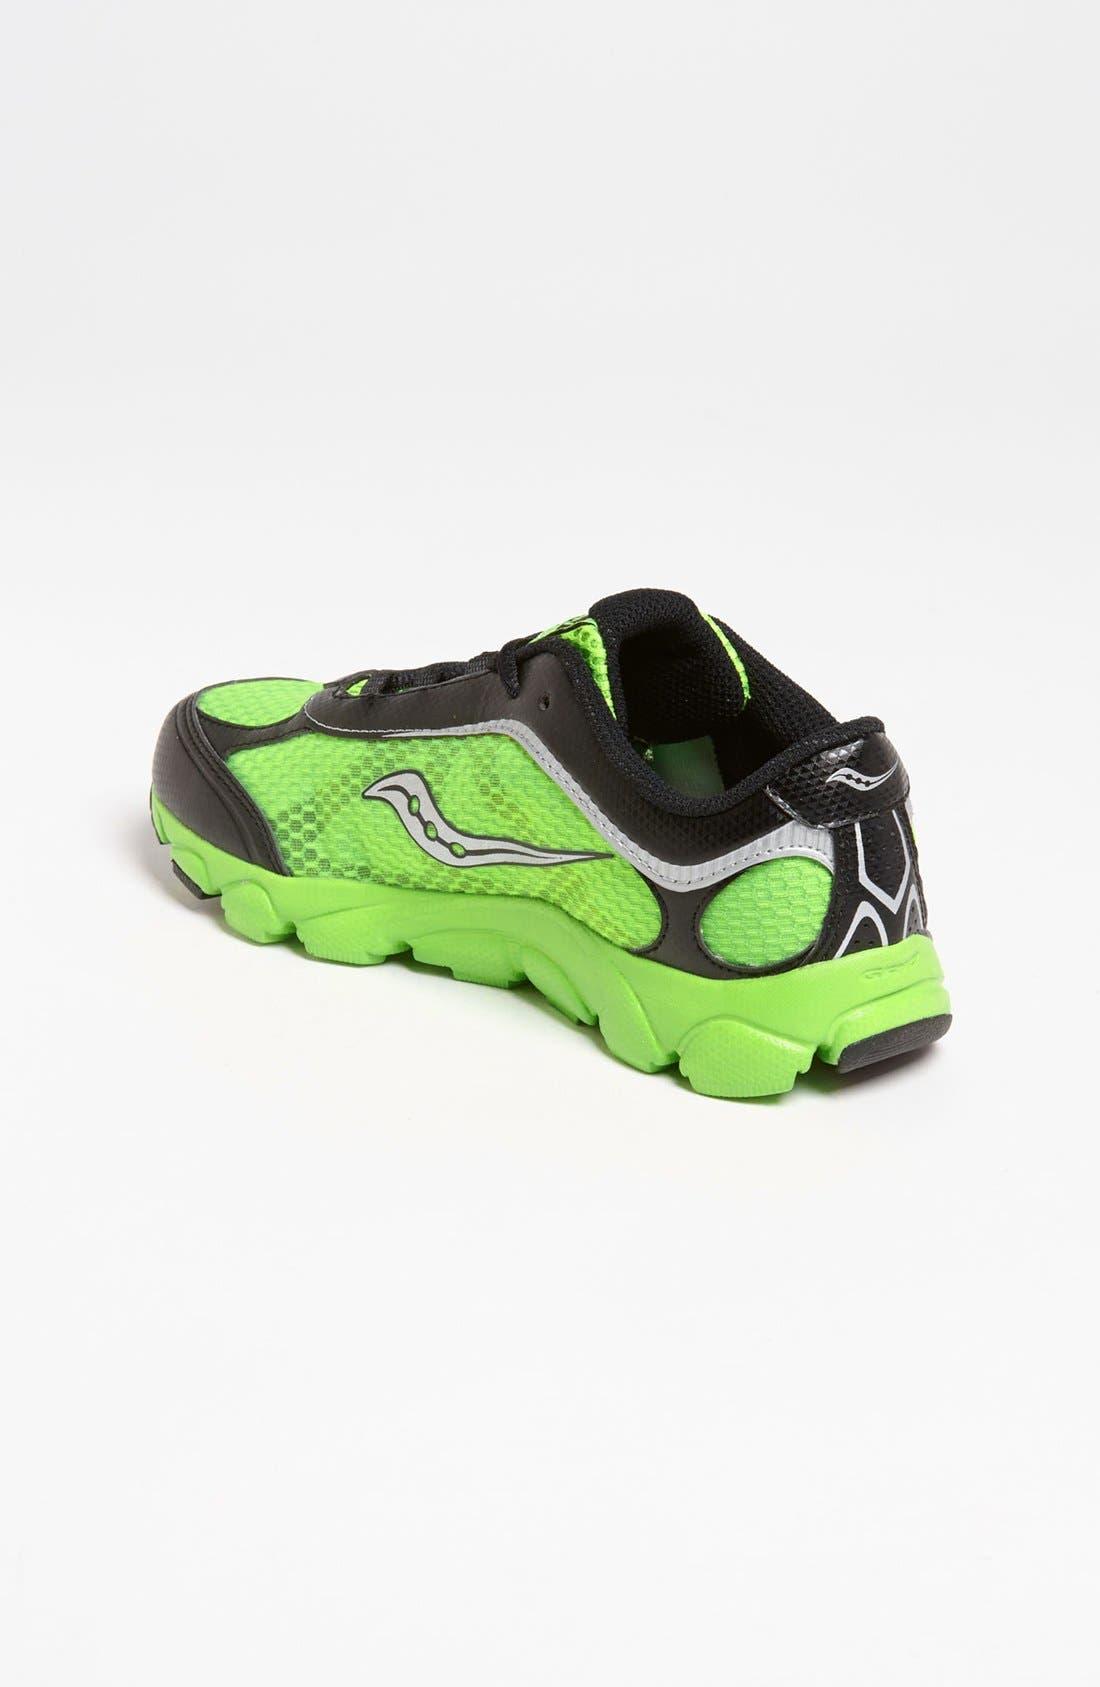 Alternate Image 2  - Saucony 'Virrata' Sneaker (Toddler, Little Kid & Big Kid)